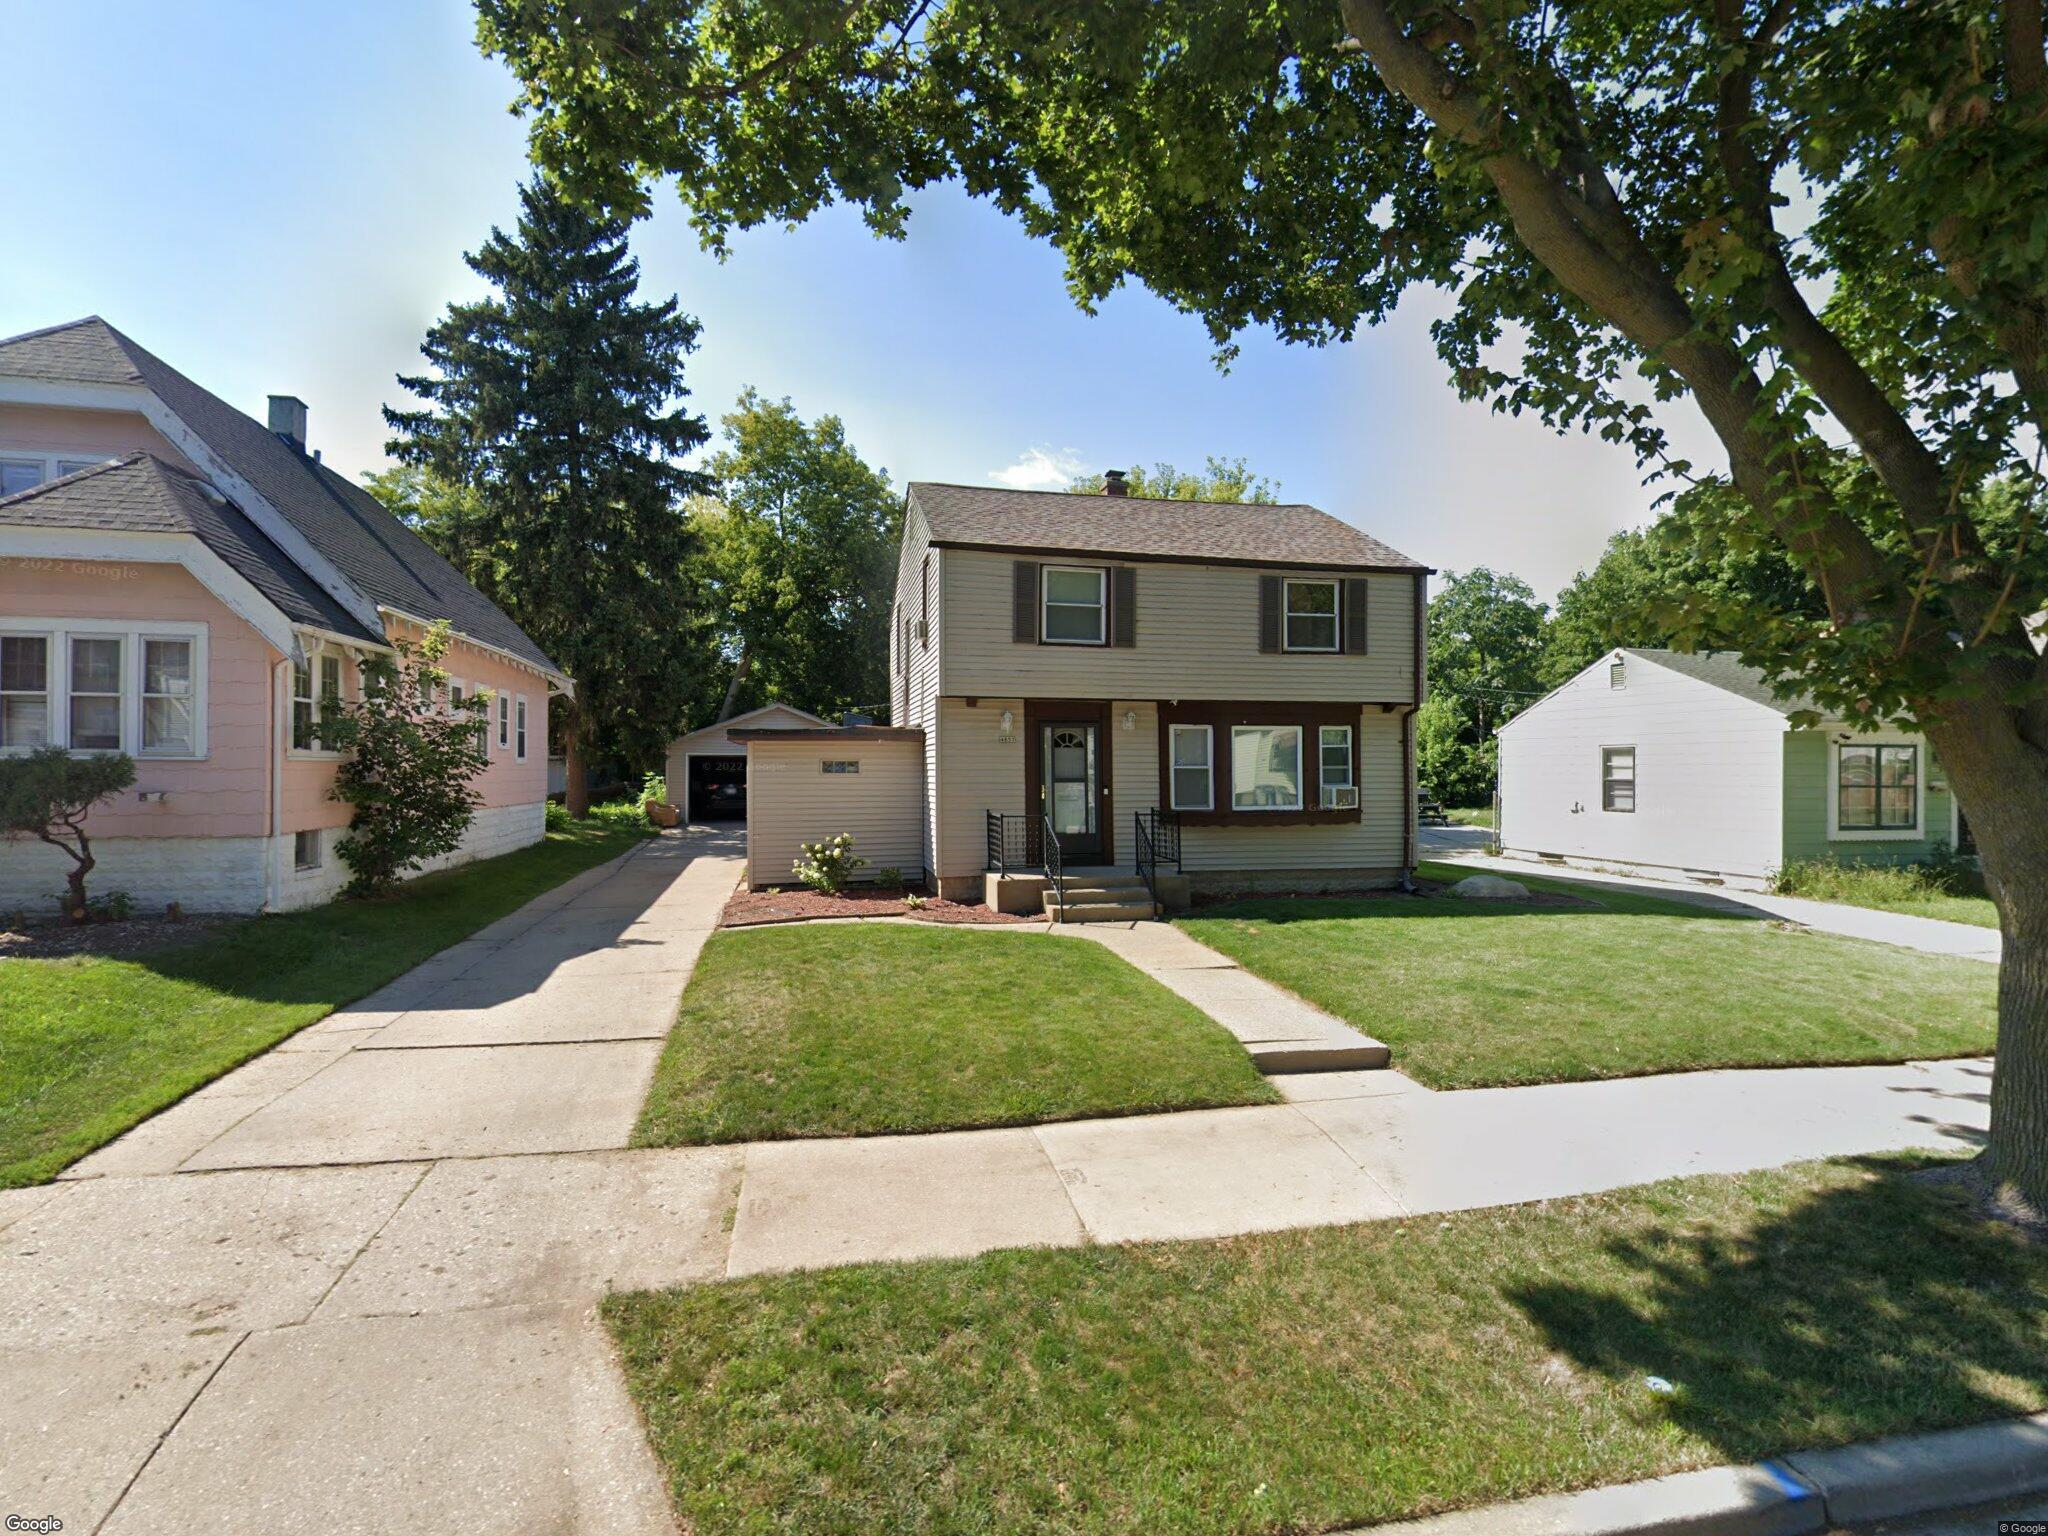 53209 Zip Code Map.4857 N 19th Pl Milwaukee Wi 53209 Foreclosure Trulia